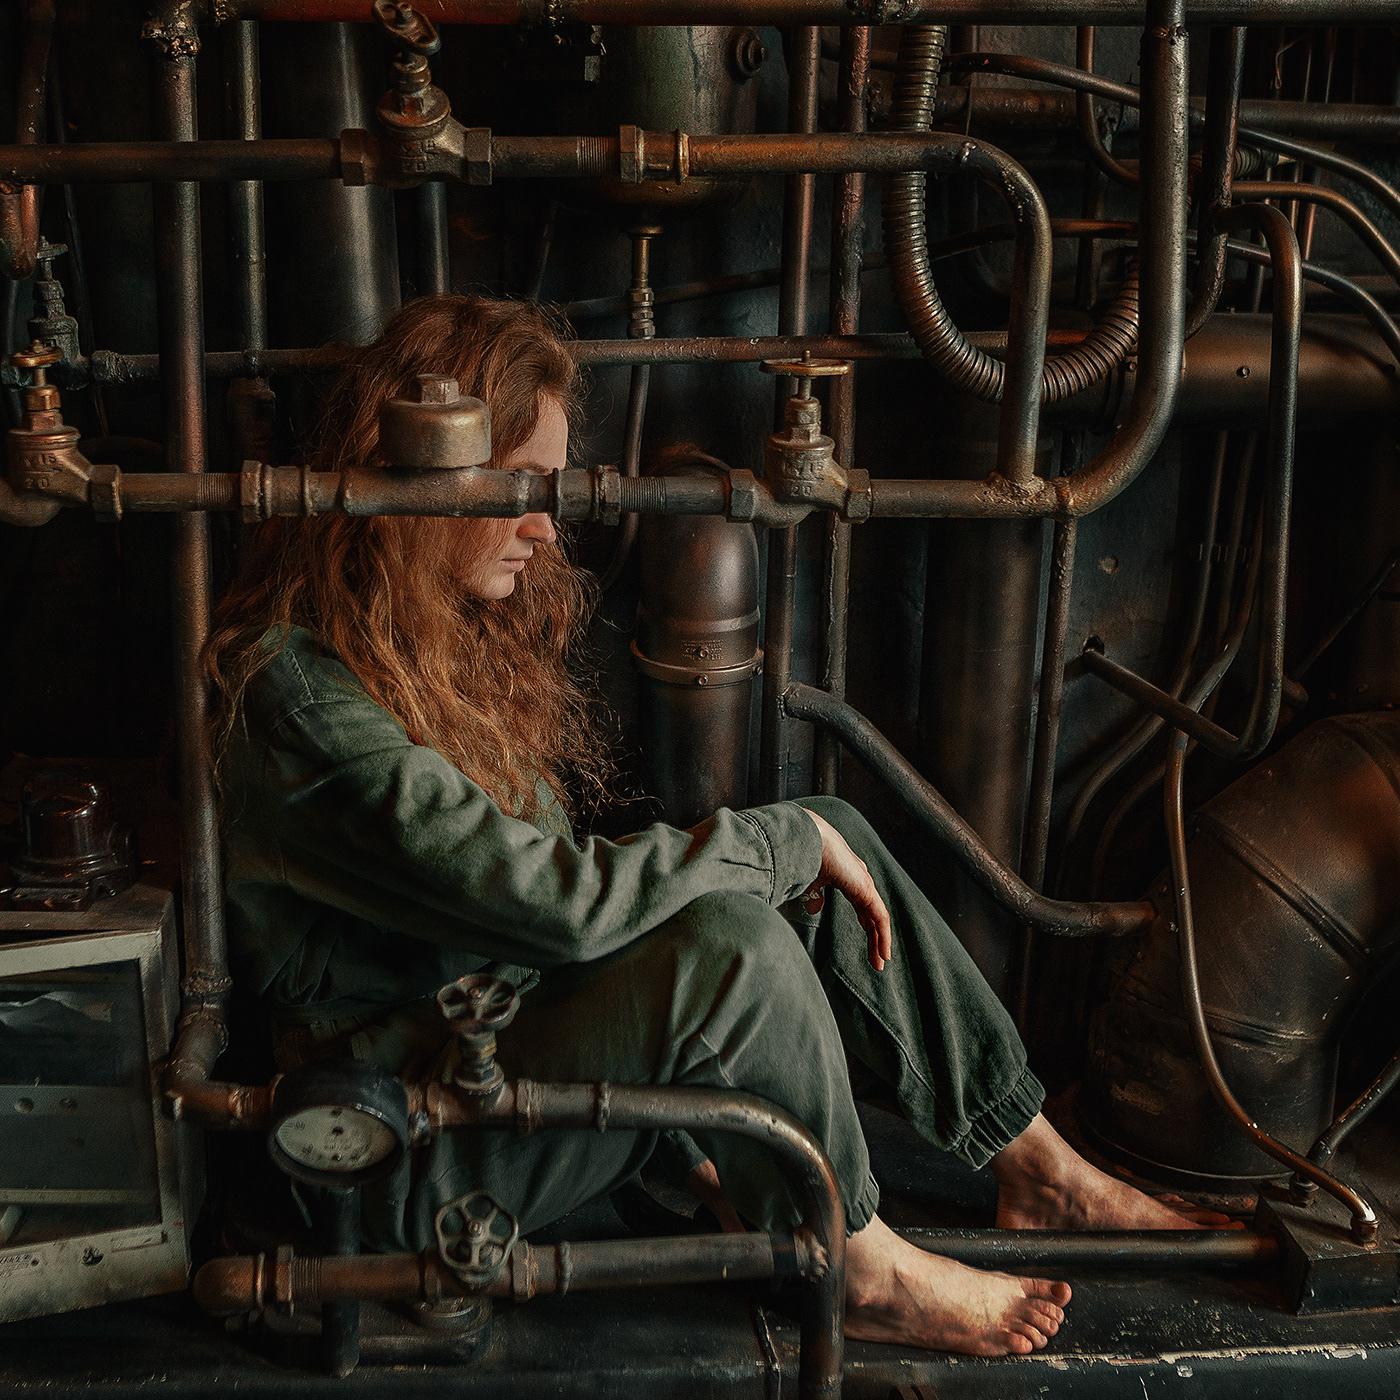 dark future girl metal model photographer rast steel Valve